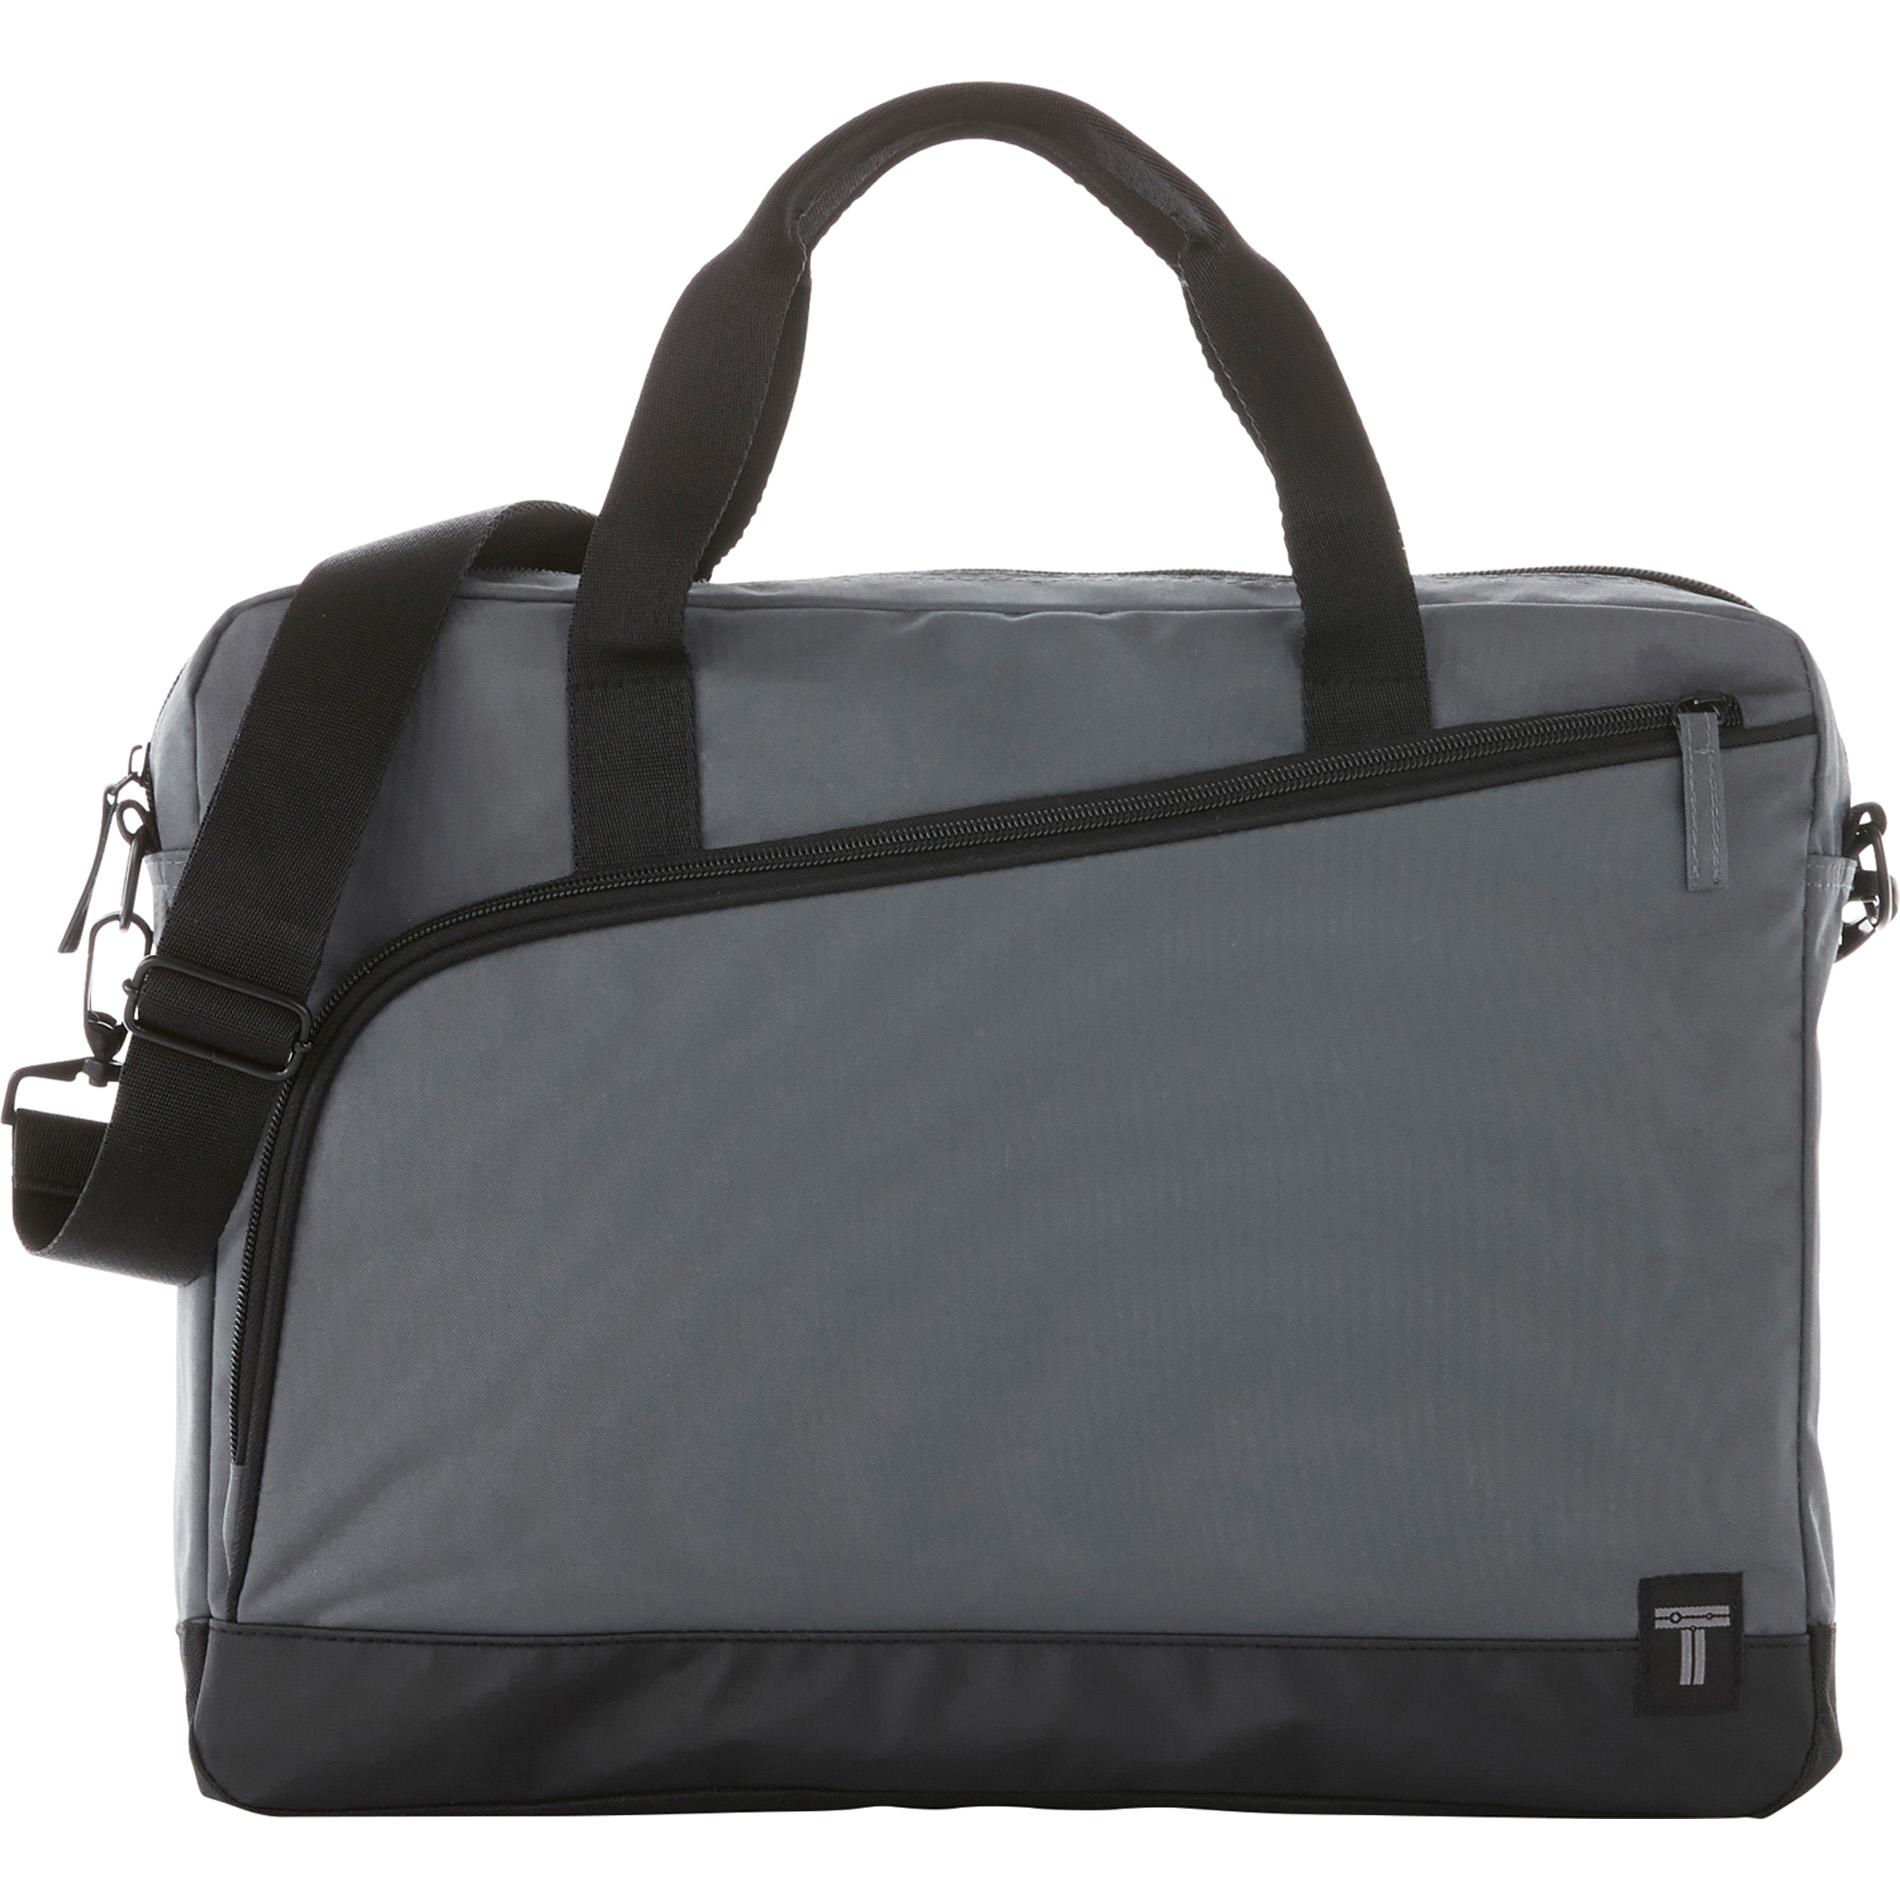 "Tranzip 2020-17 - 15"" Computer Briefcase"